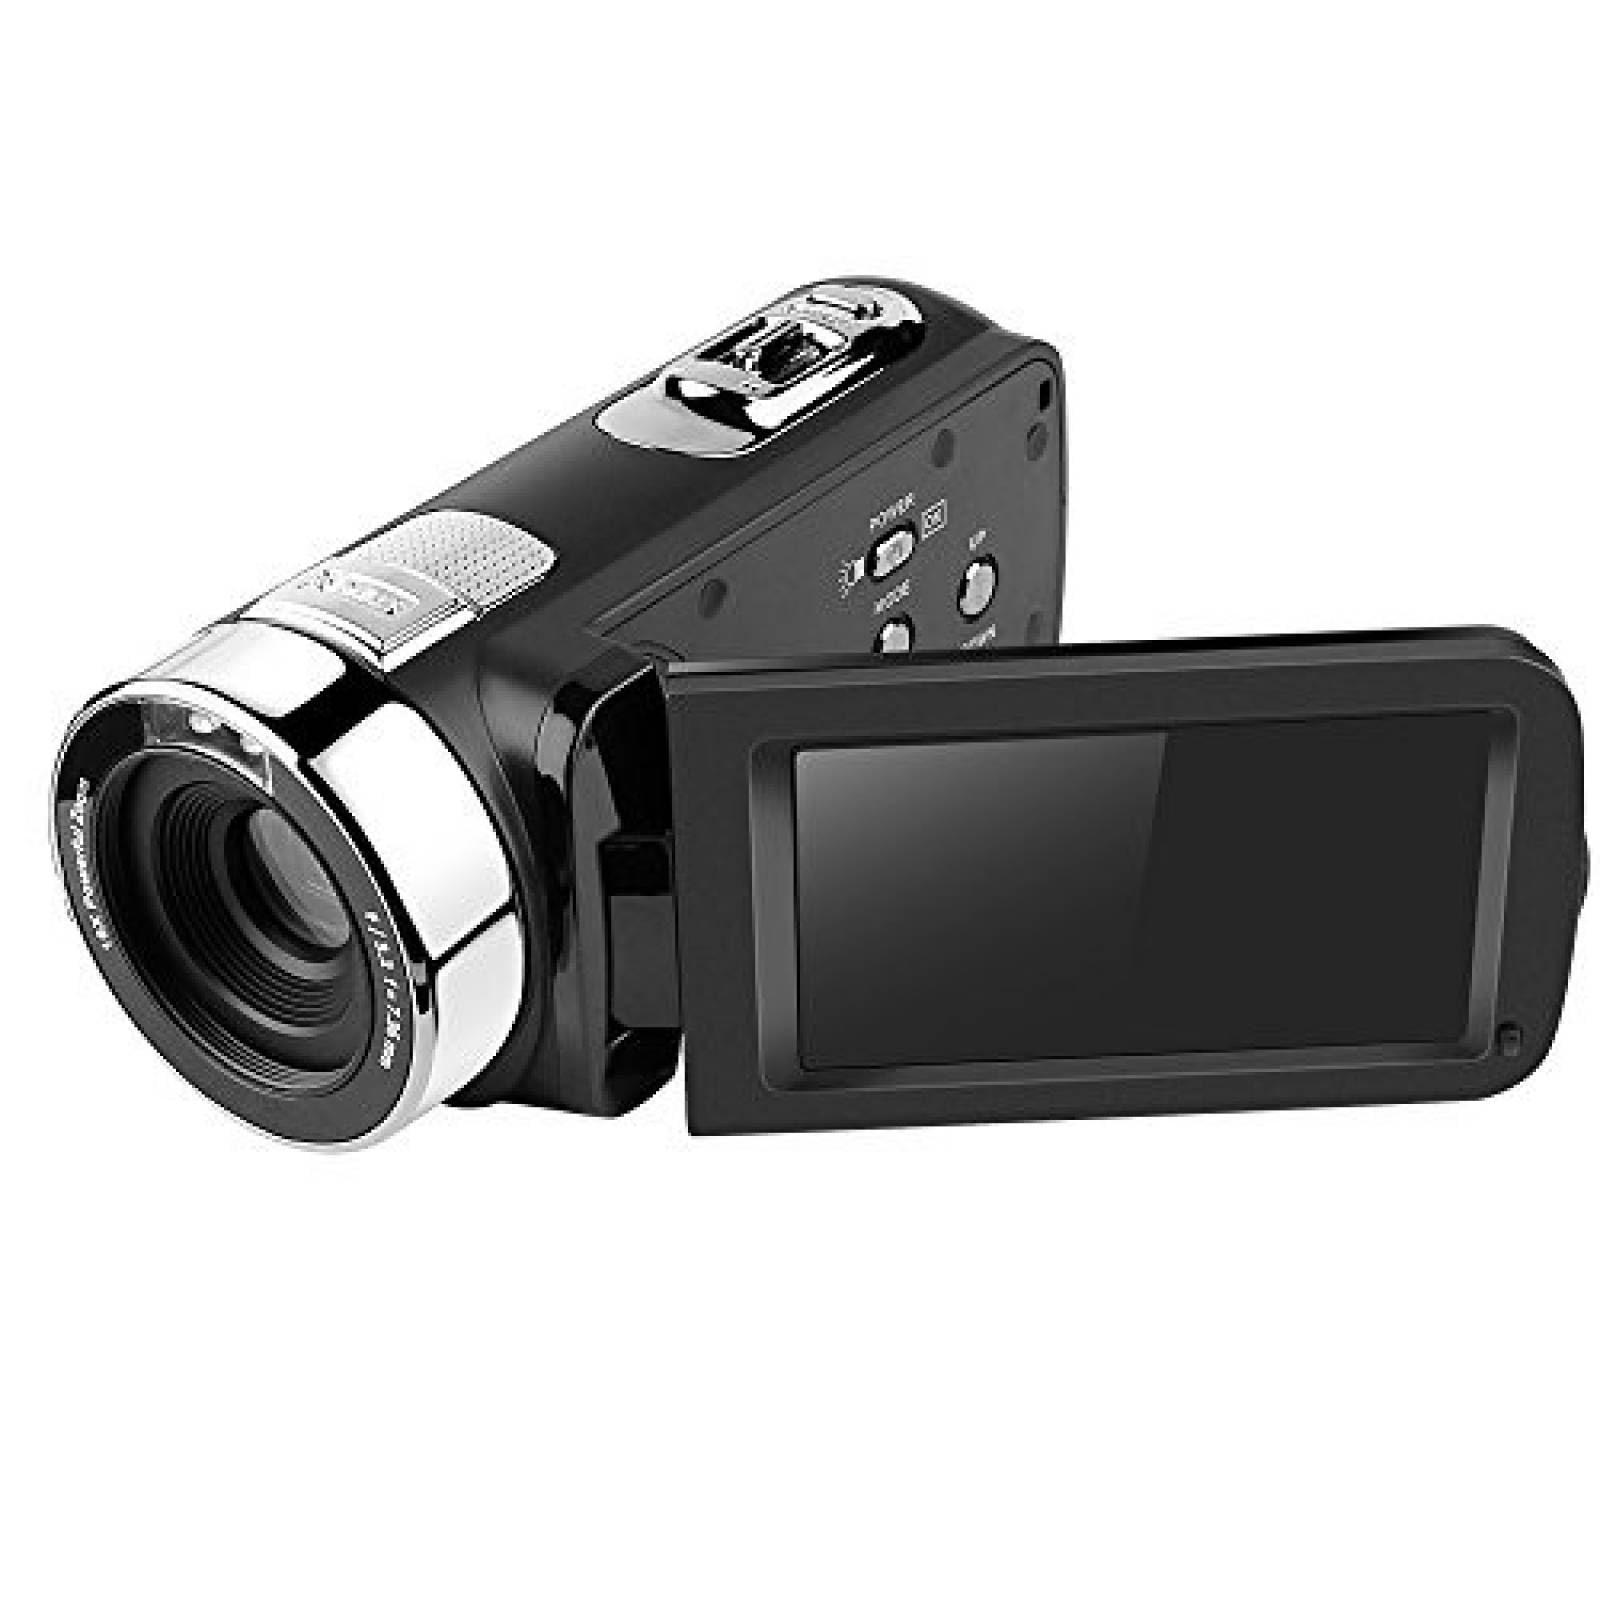 Videocámara digital Dotca RV02 FHD DV visión nocturna -negra